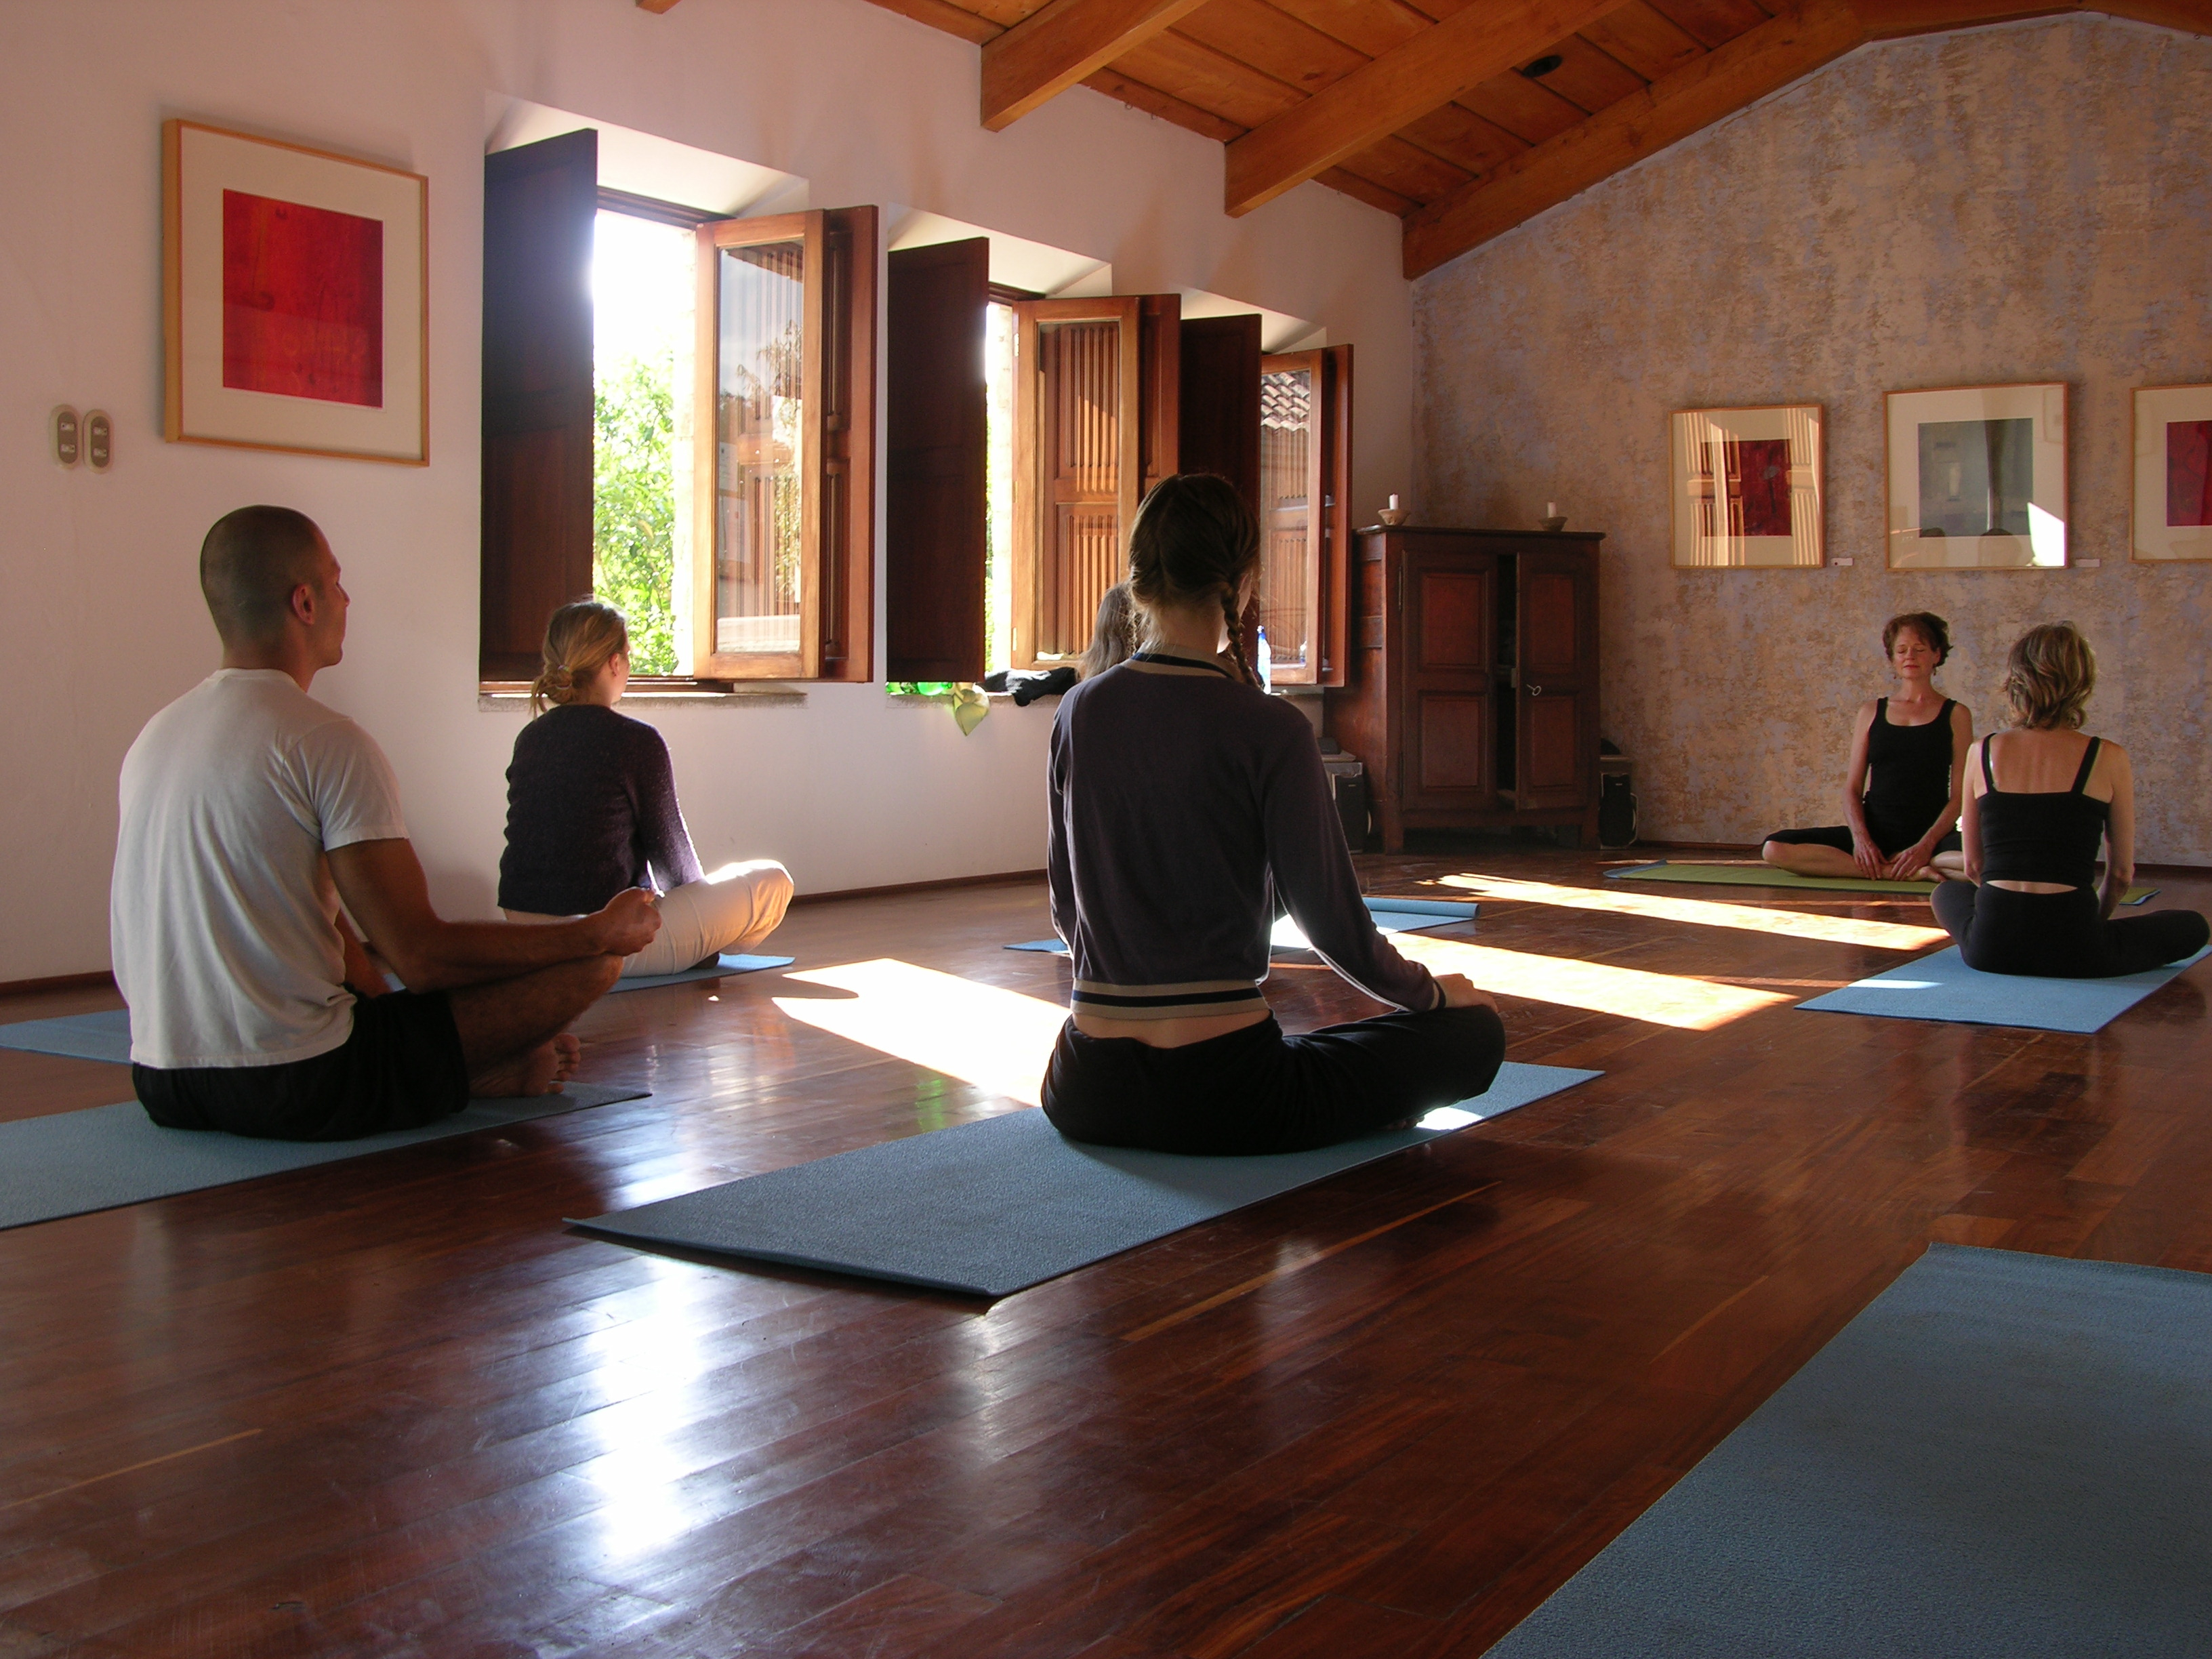 Meson Panza Verde Yoga Studio